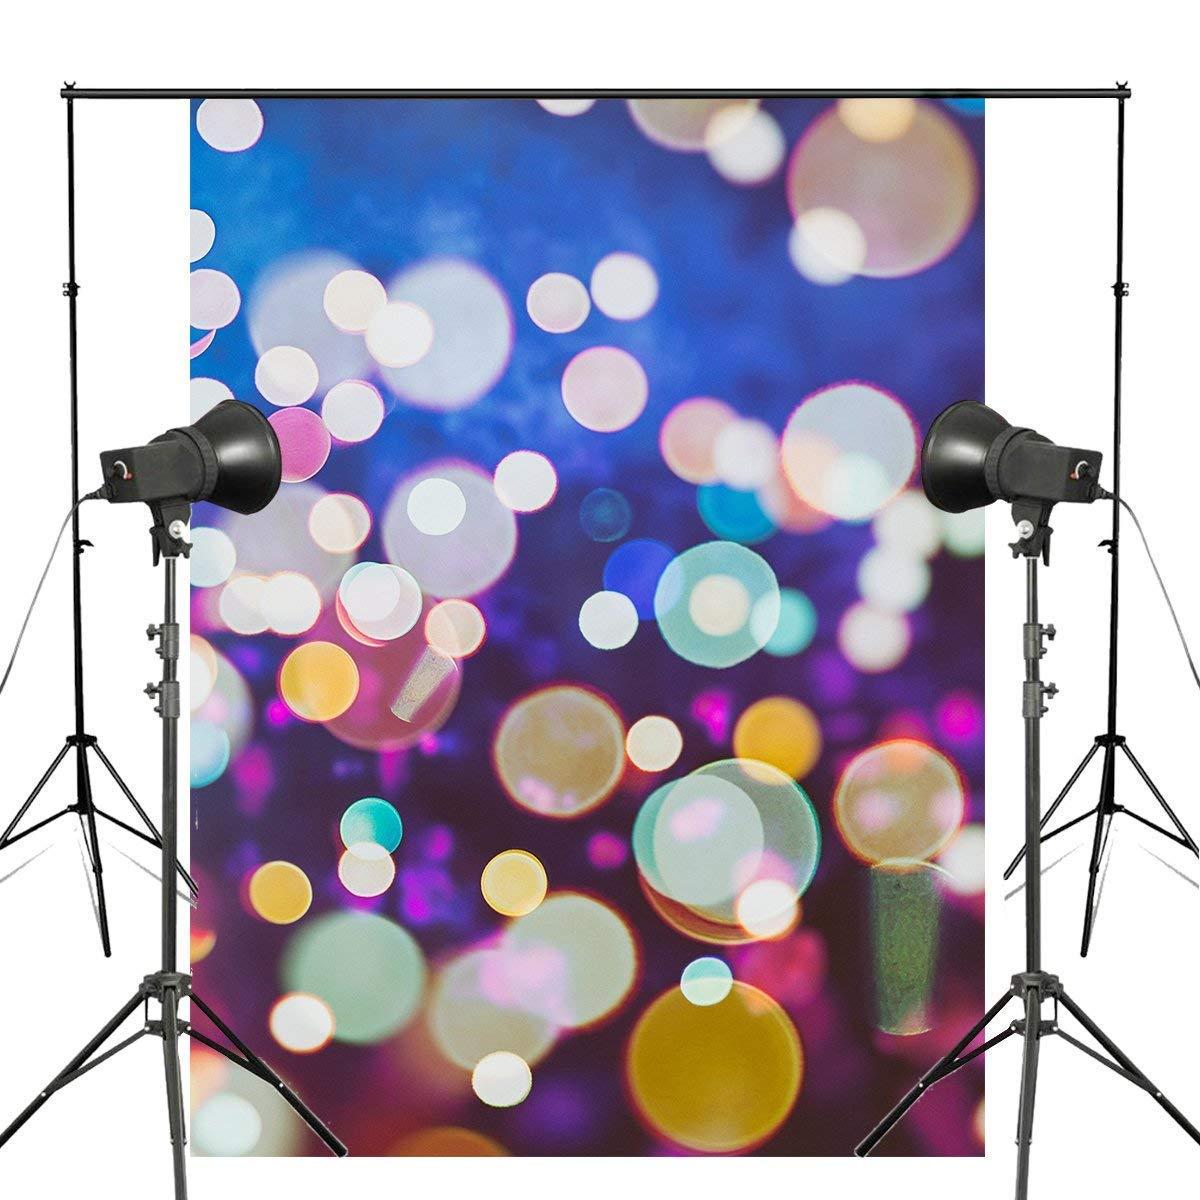 ERTIANANG 5x7ft Colorful Bubble Photography Backdrop Light Background Children Photo Studio Wall Bedroom Backdrop